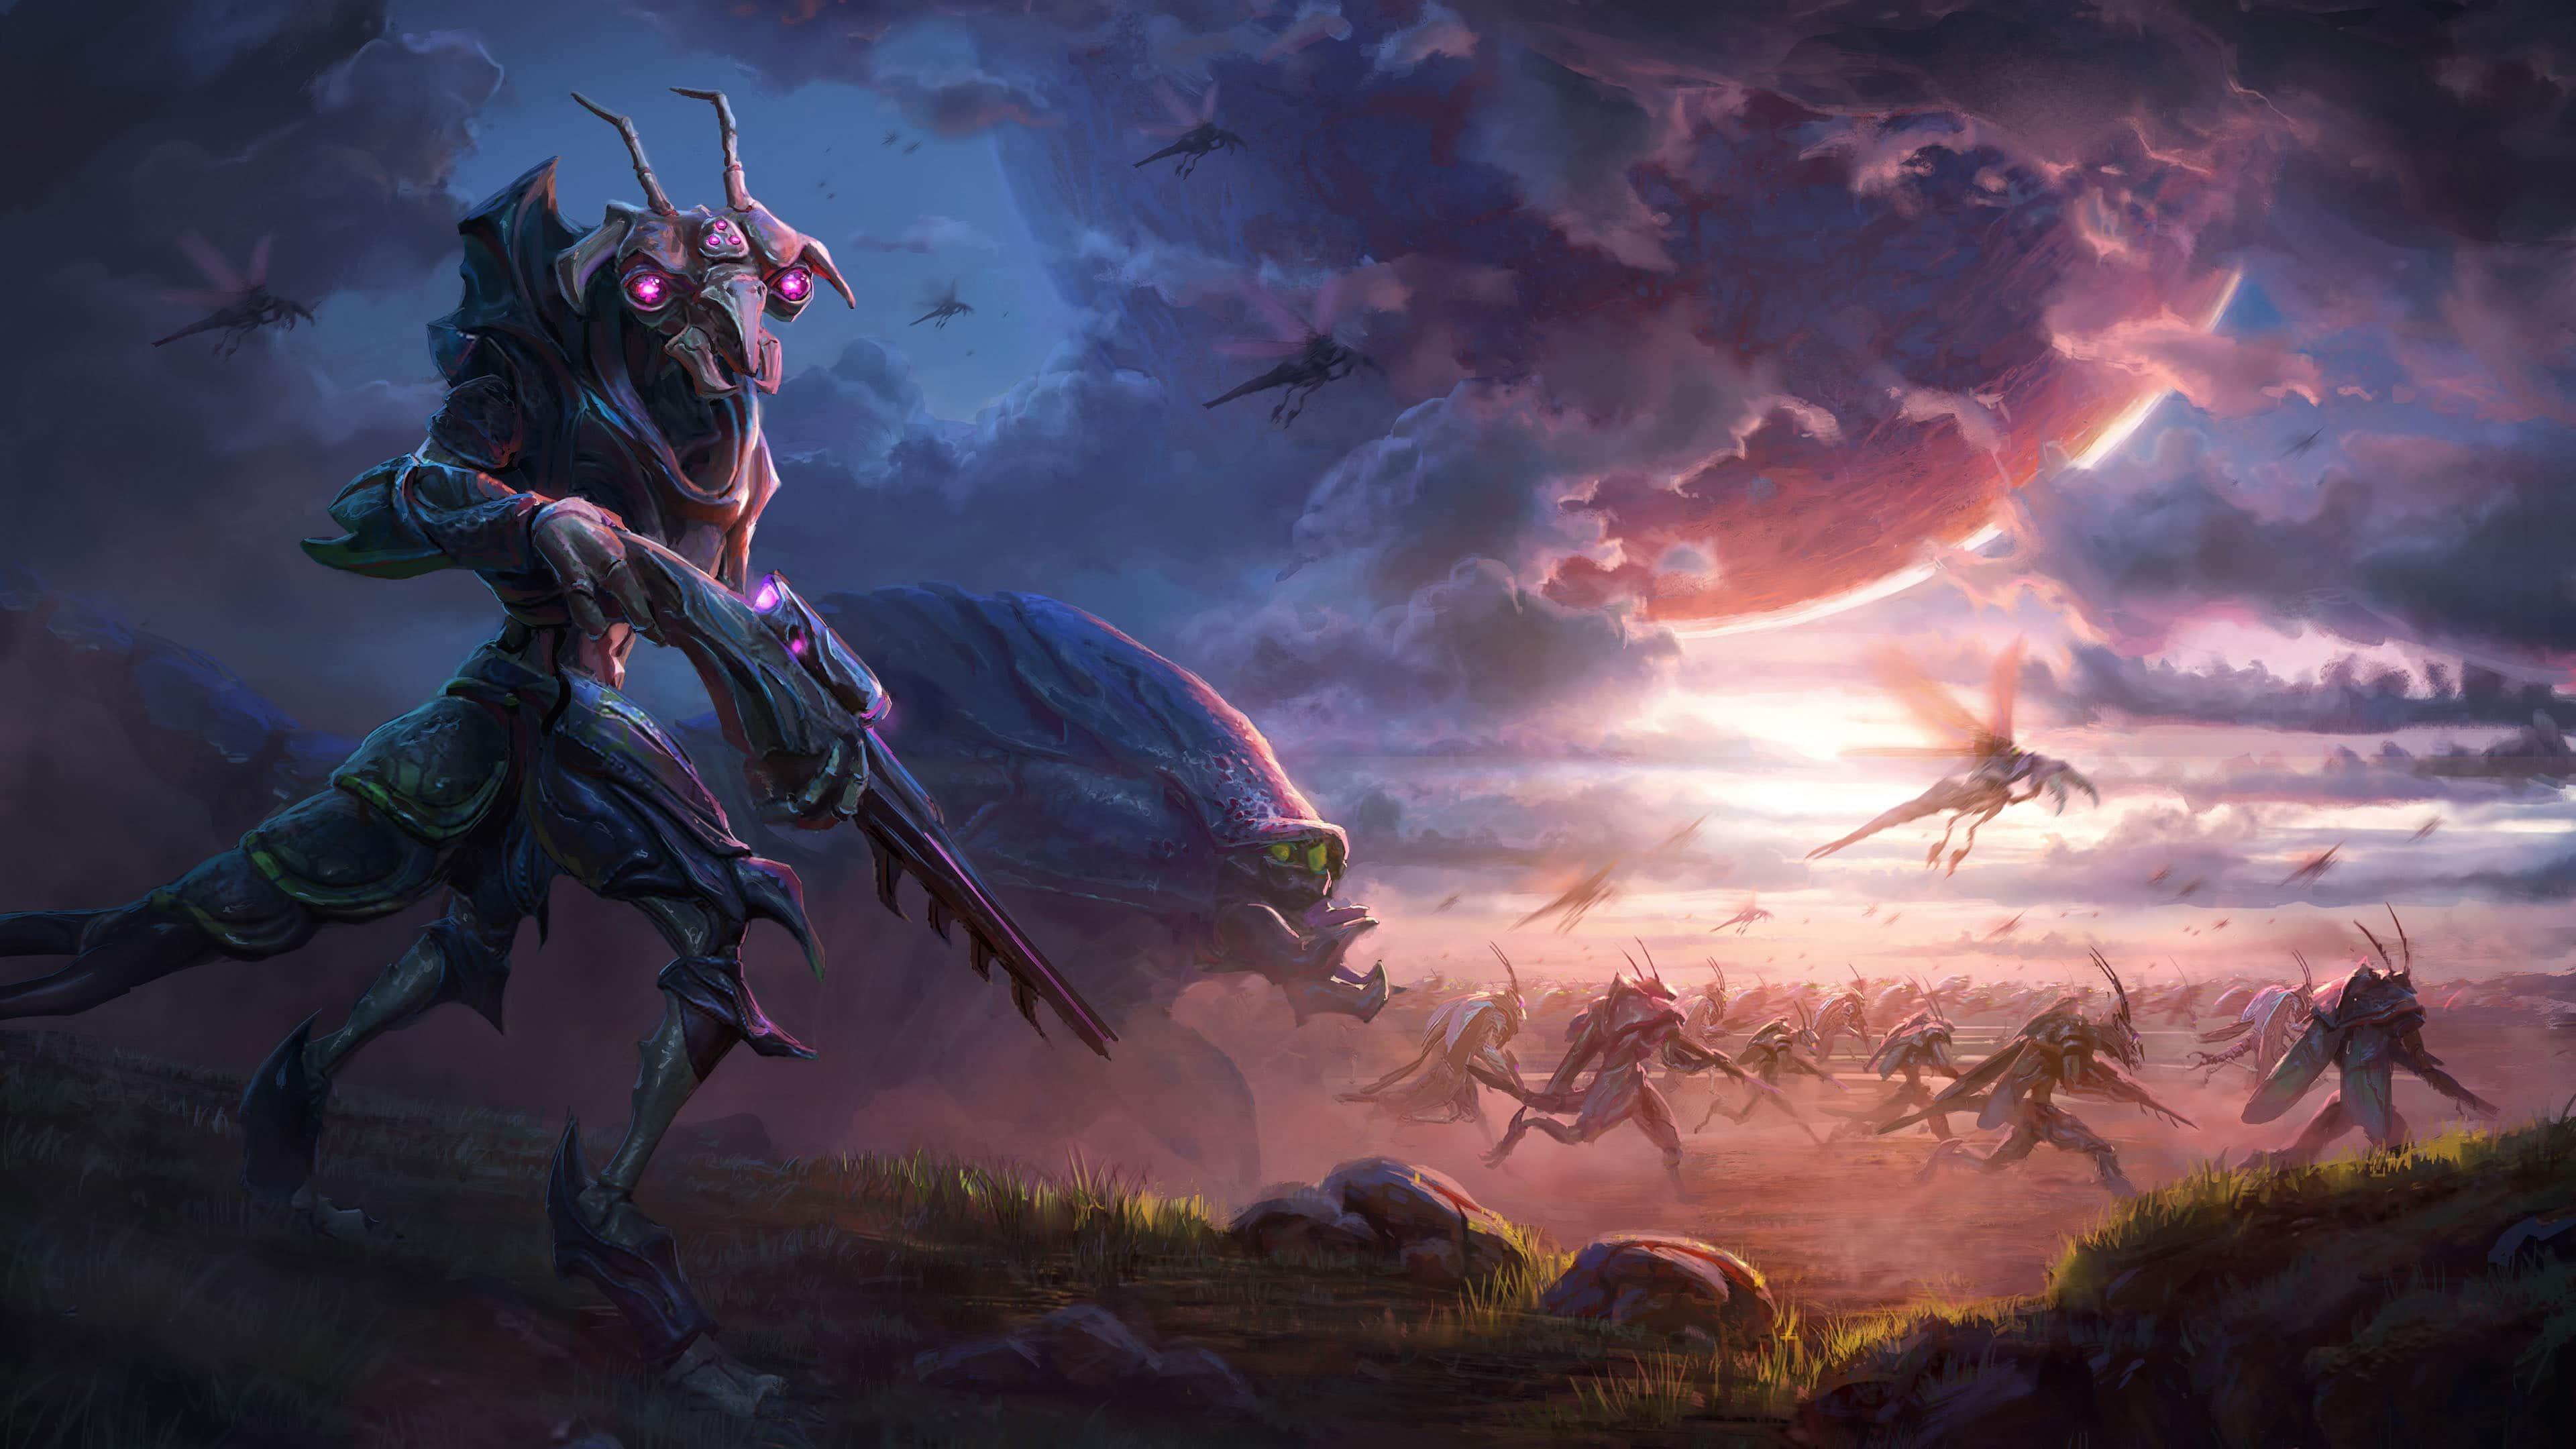 Age of Wonders: Planetfall; wallpaper: hmyz